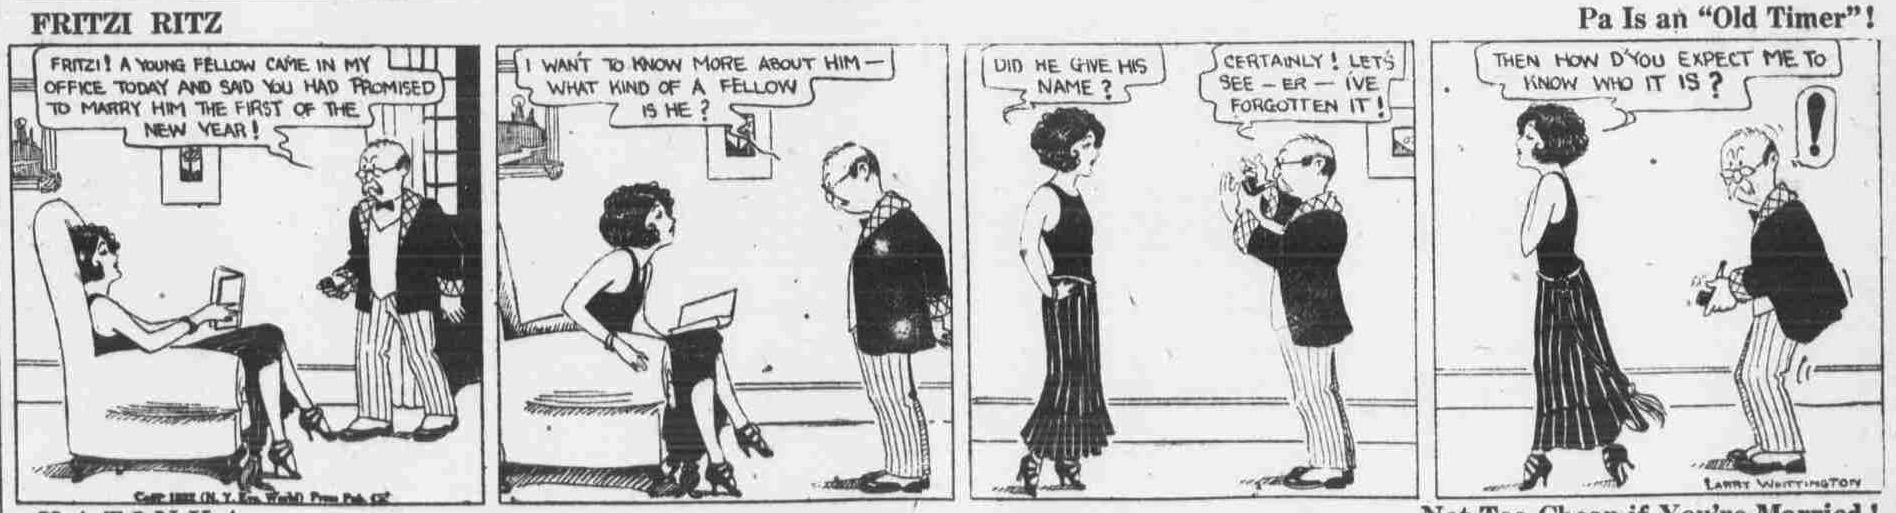 Dec. 28, 1922